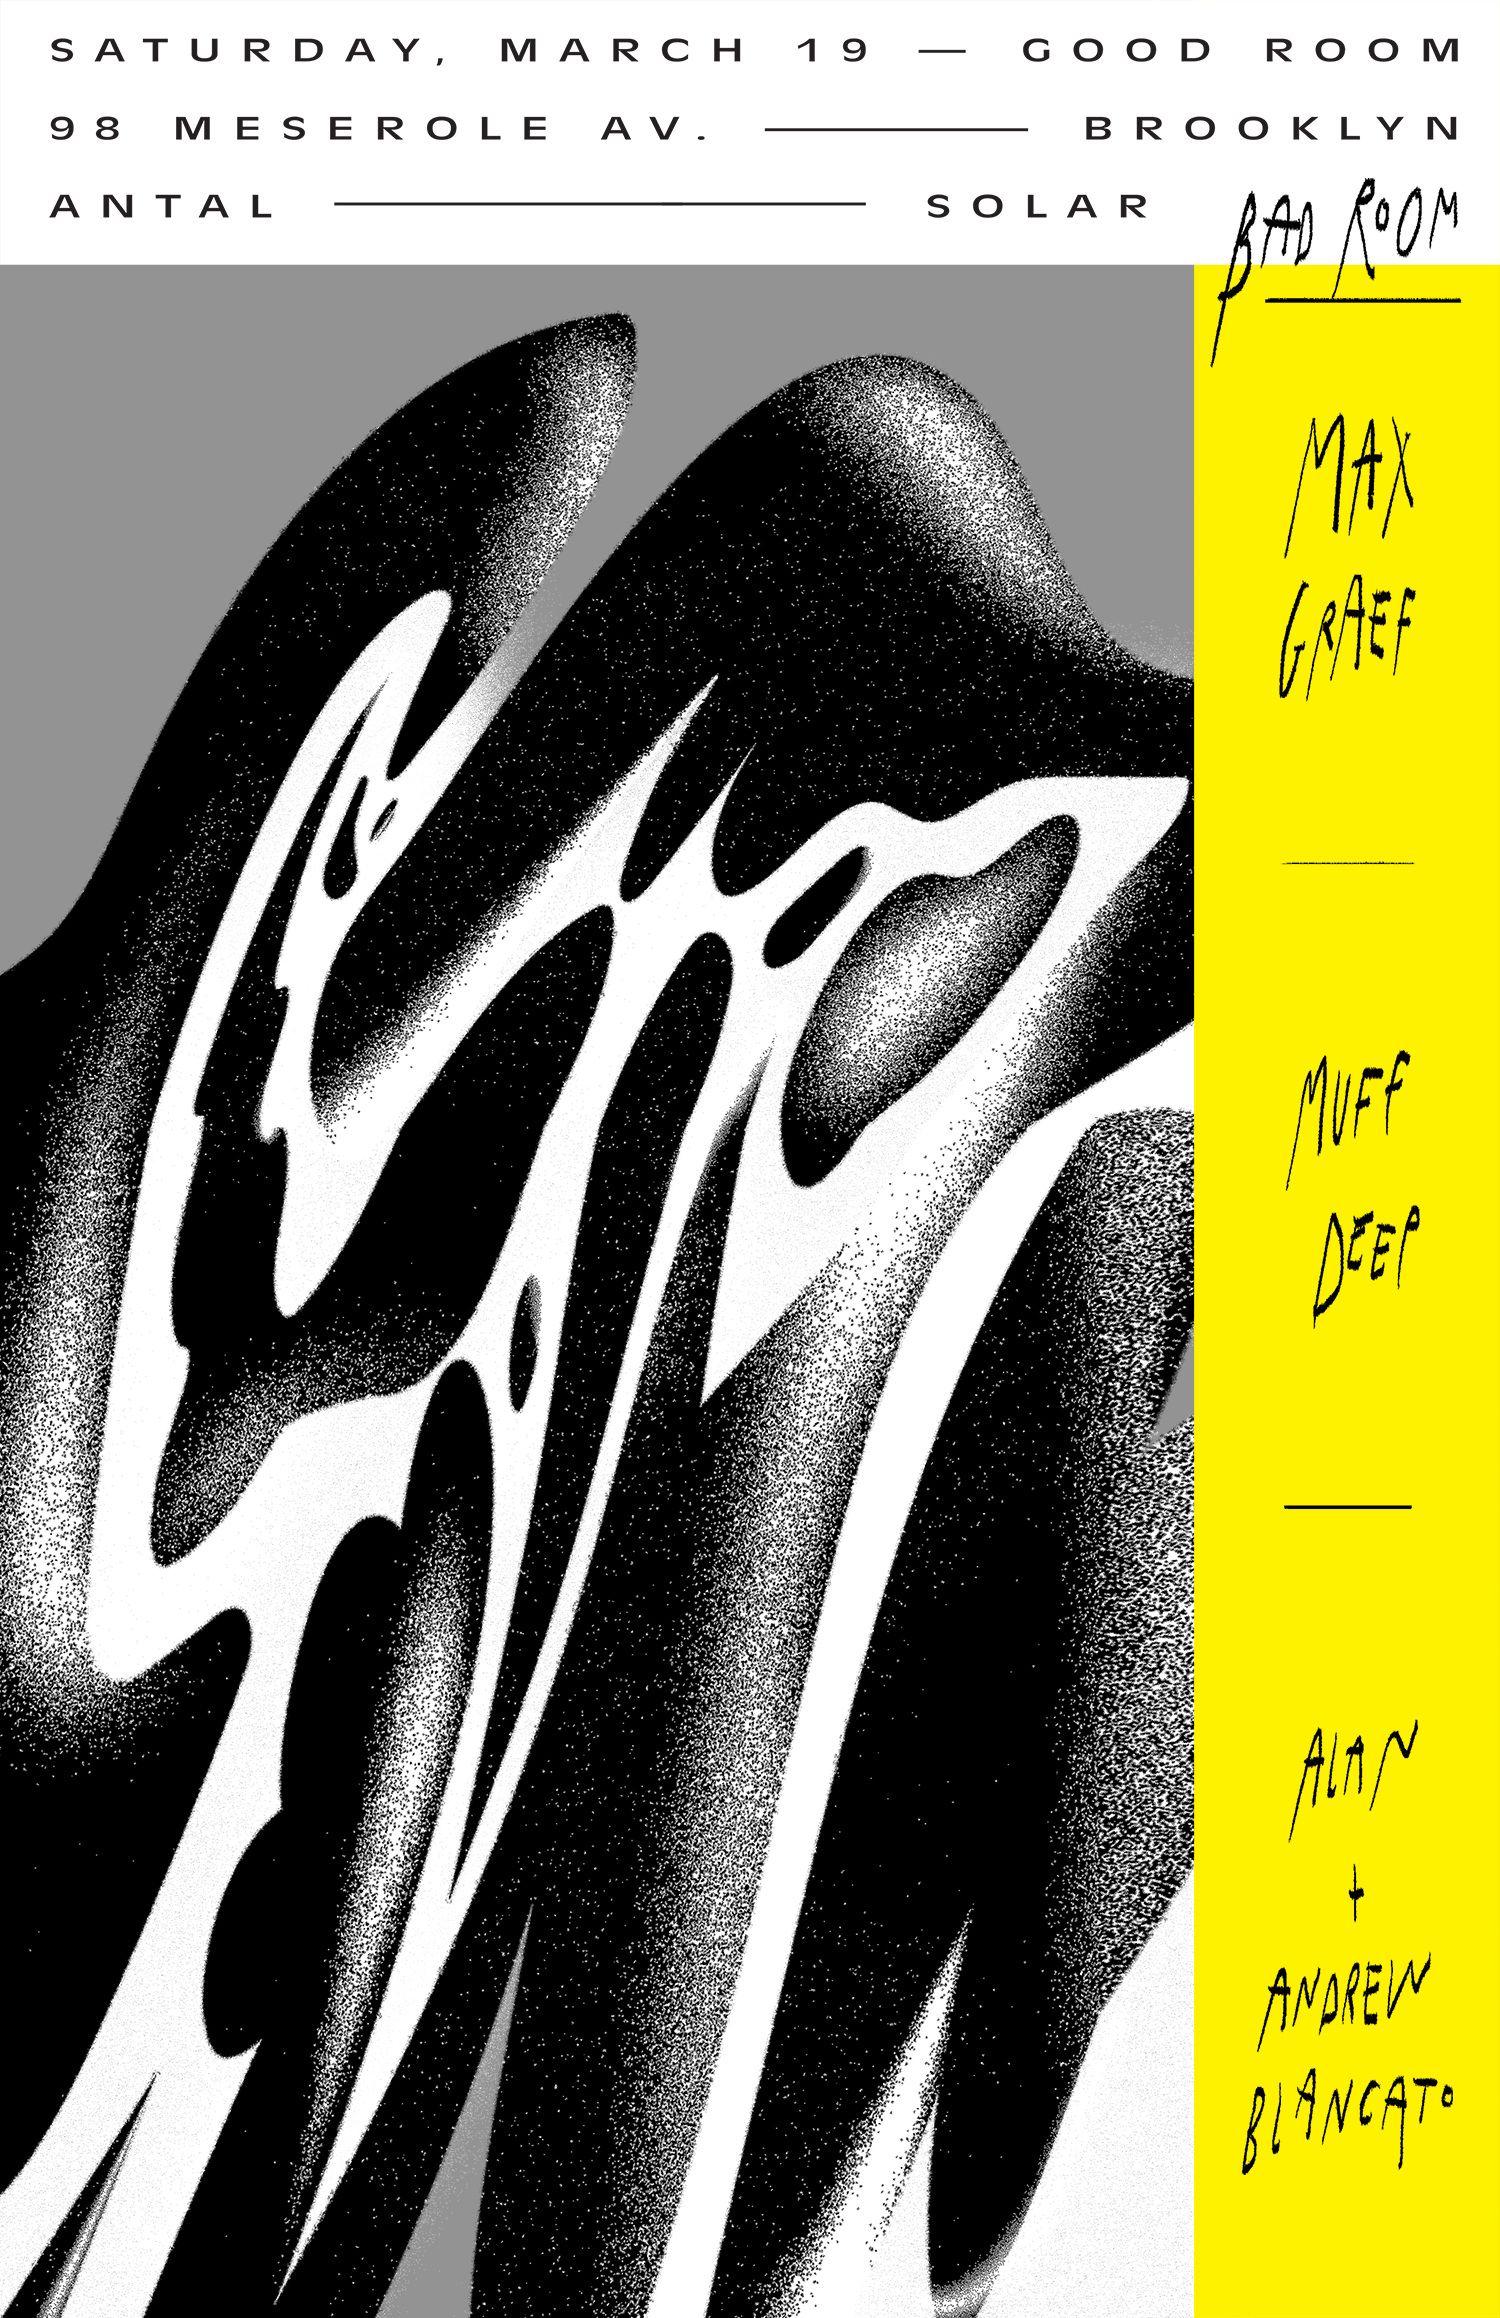 Antal Solar Good Room Poster 2016 Graphic Design Typography Graphic Design Graphic Poster